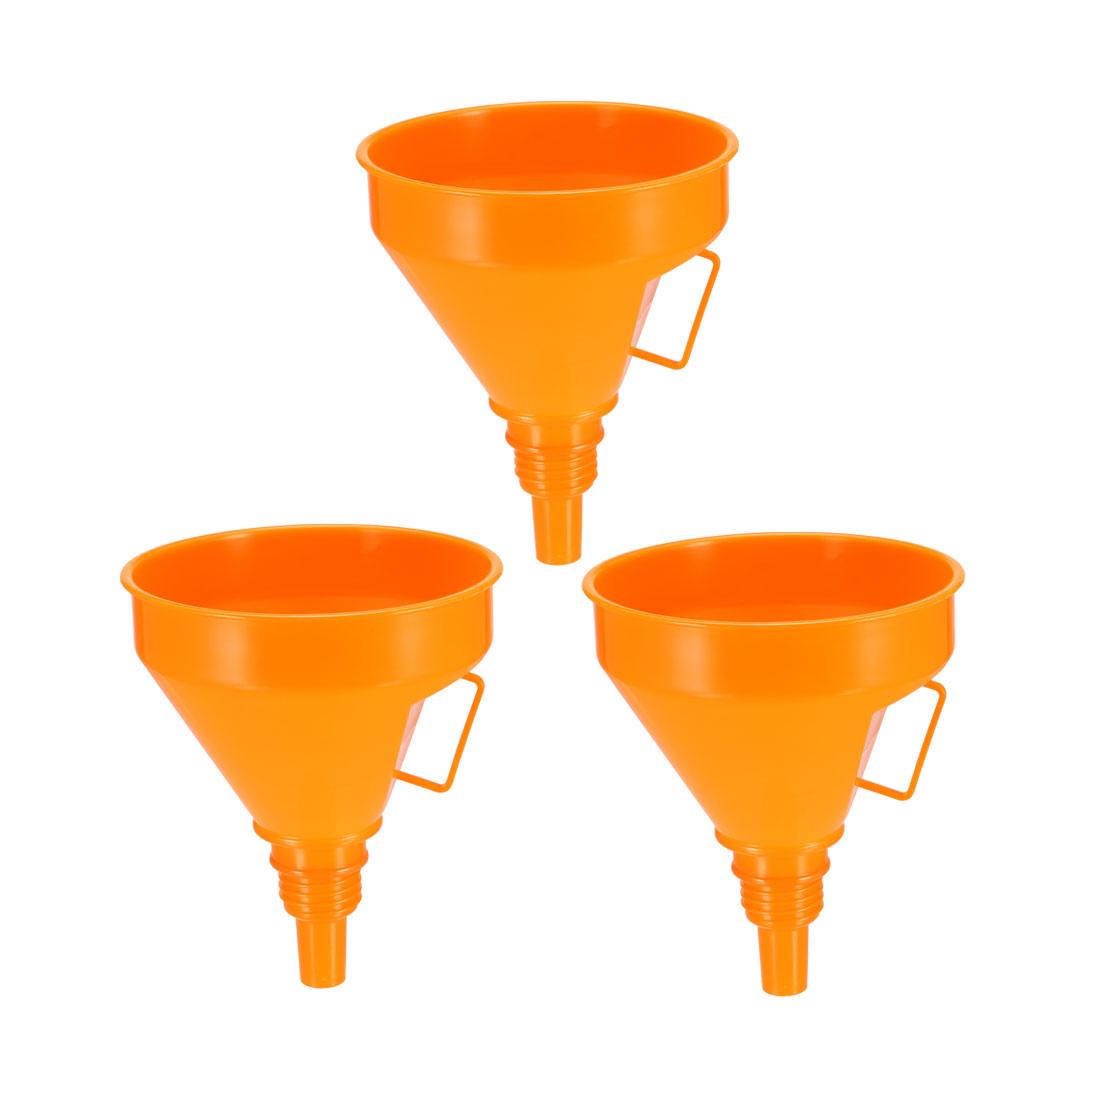 "Filter Funnel 5"" Plastic Feul Funnel Orange for Engine Oil Water Fuel 3pcs"